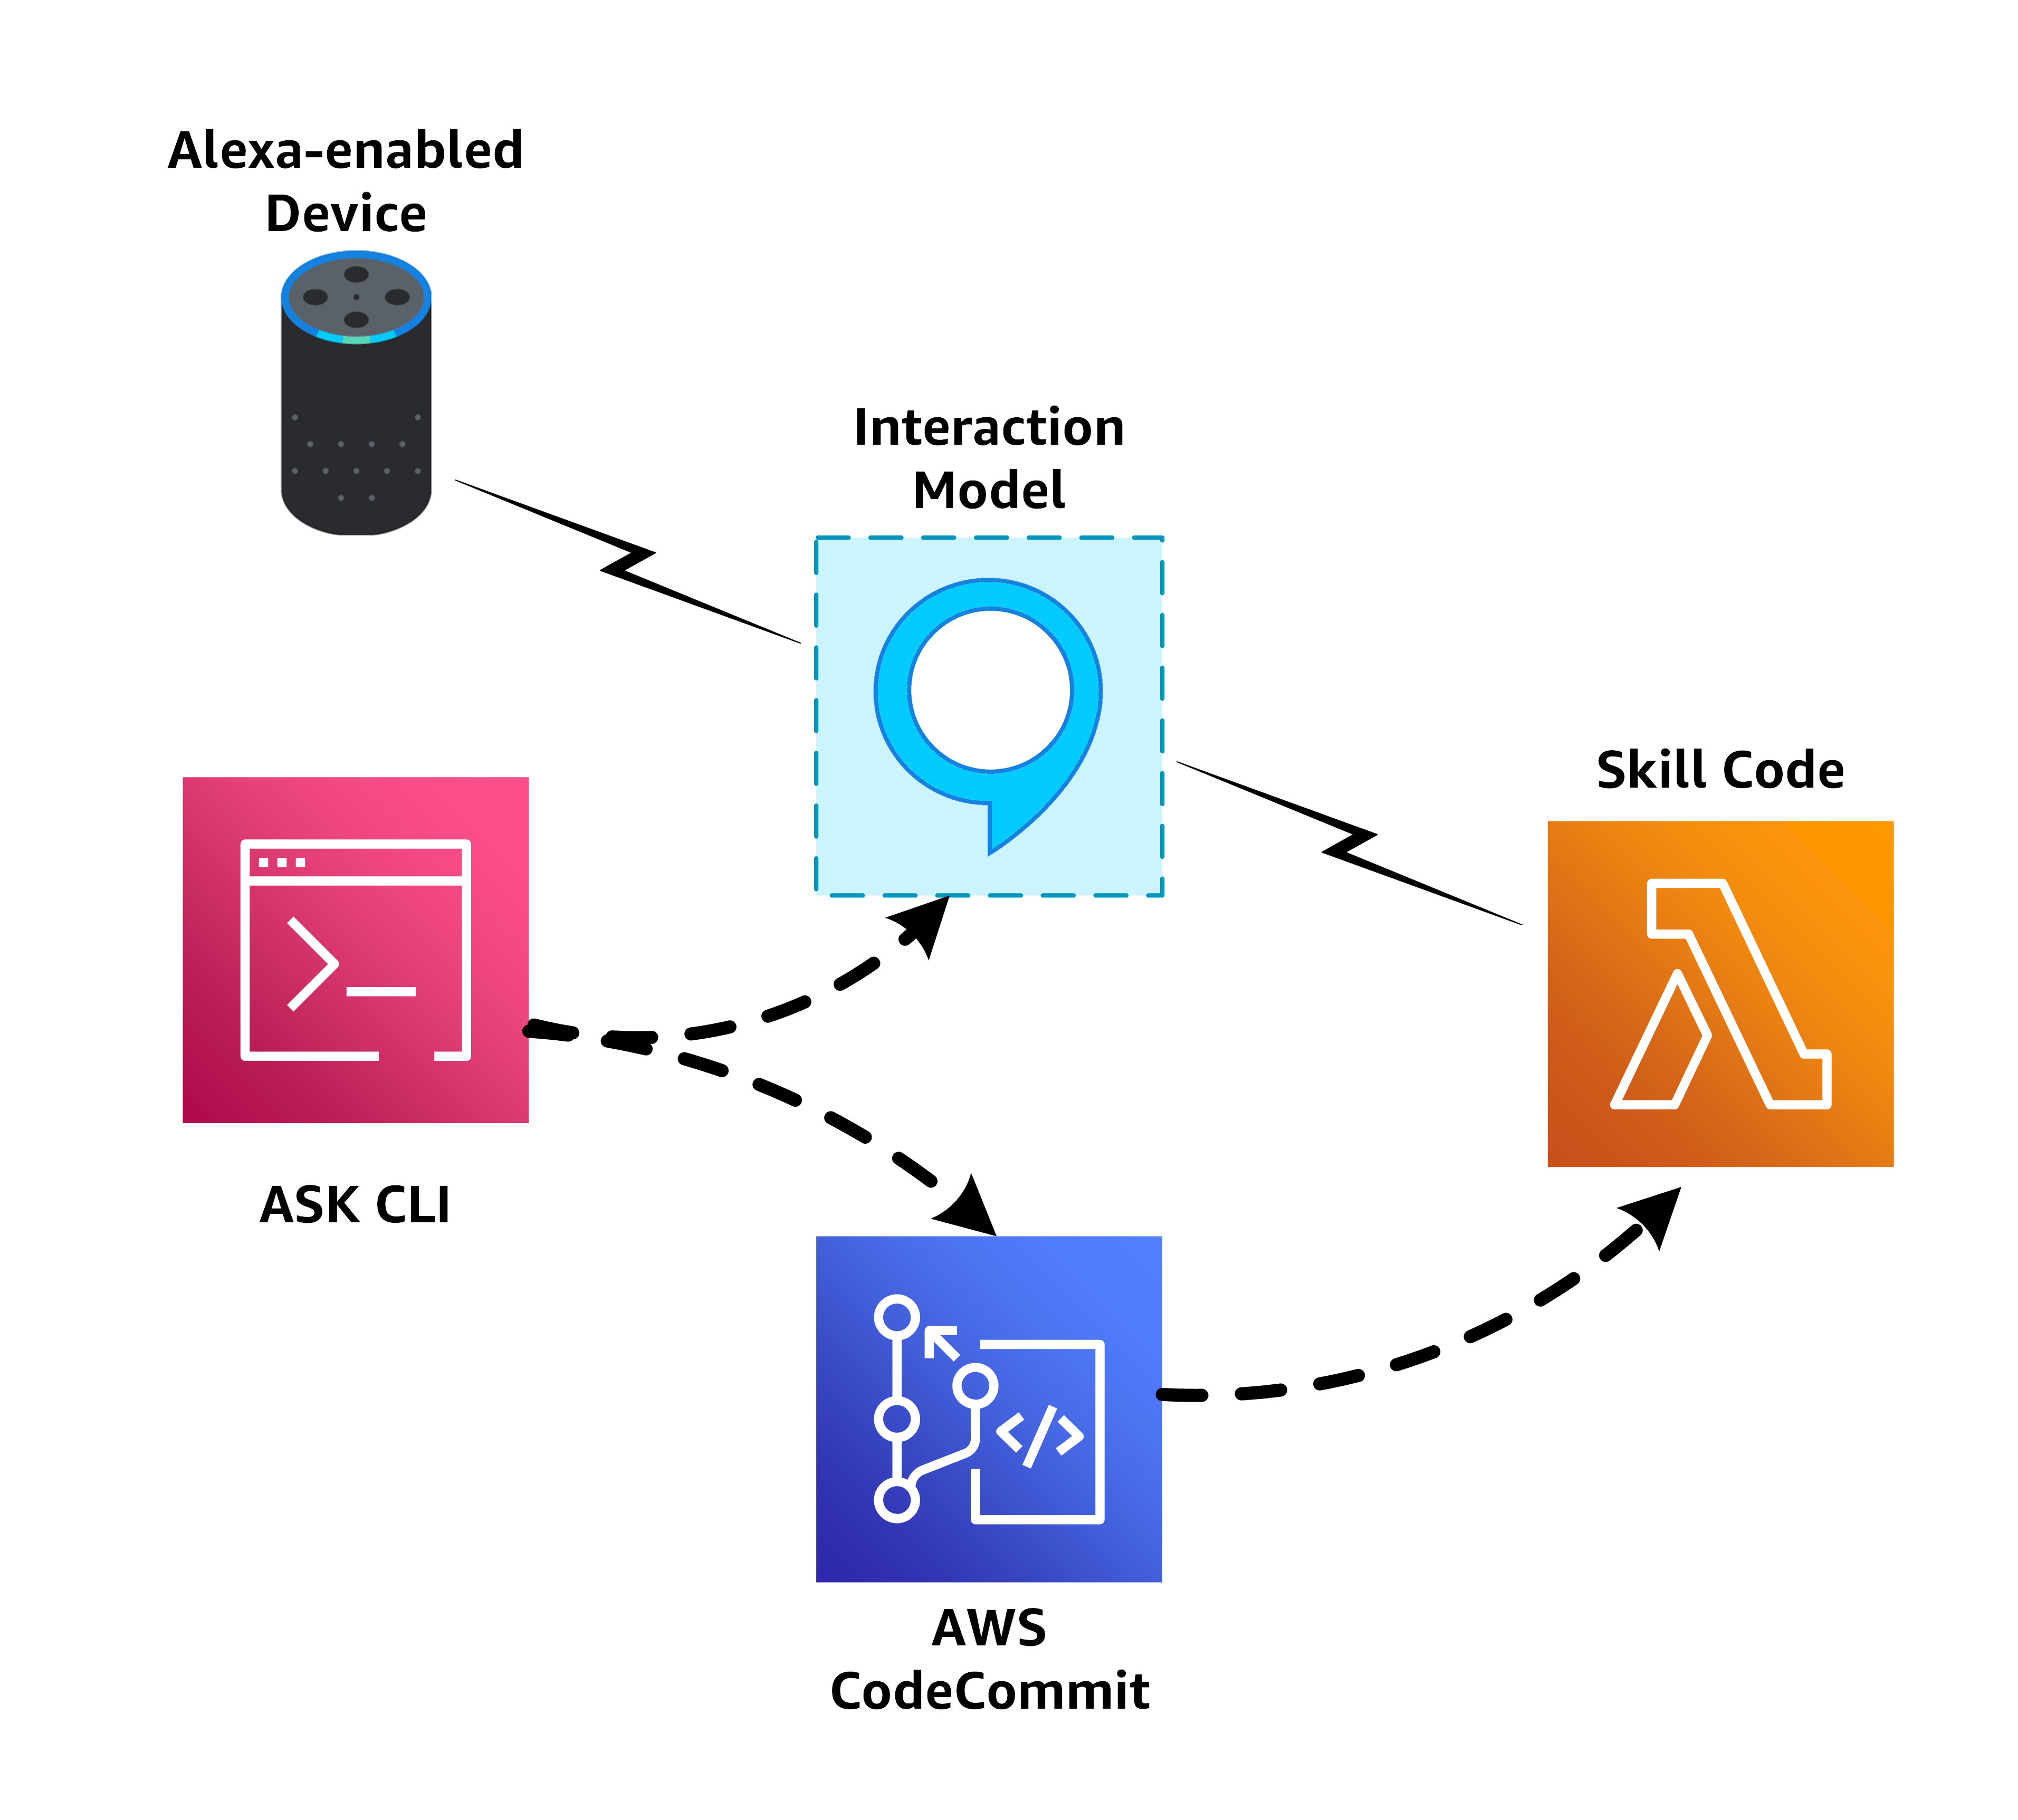 Using the Alexa Skills Kit Command Line Interface with Alexa